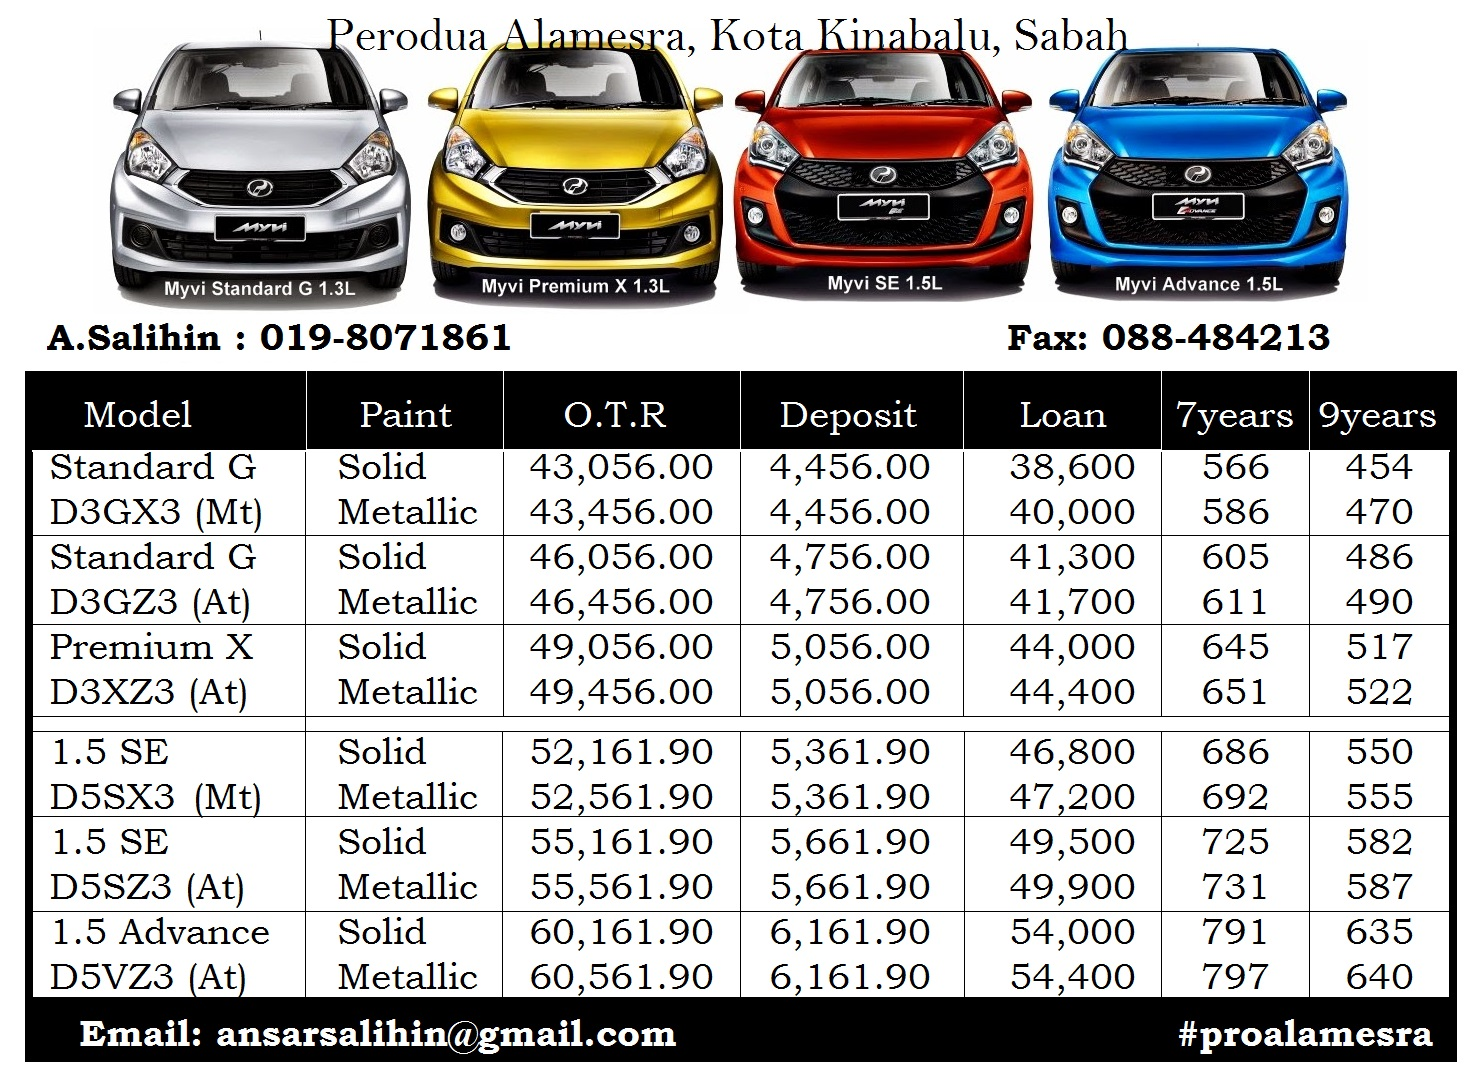 Perodua Myvi Pricelist Kota Kinabalu Sabah